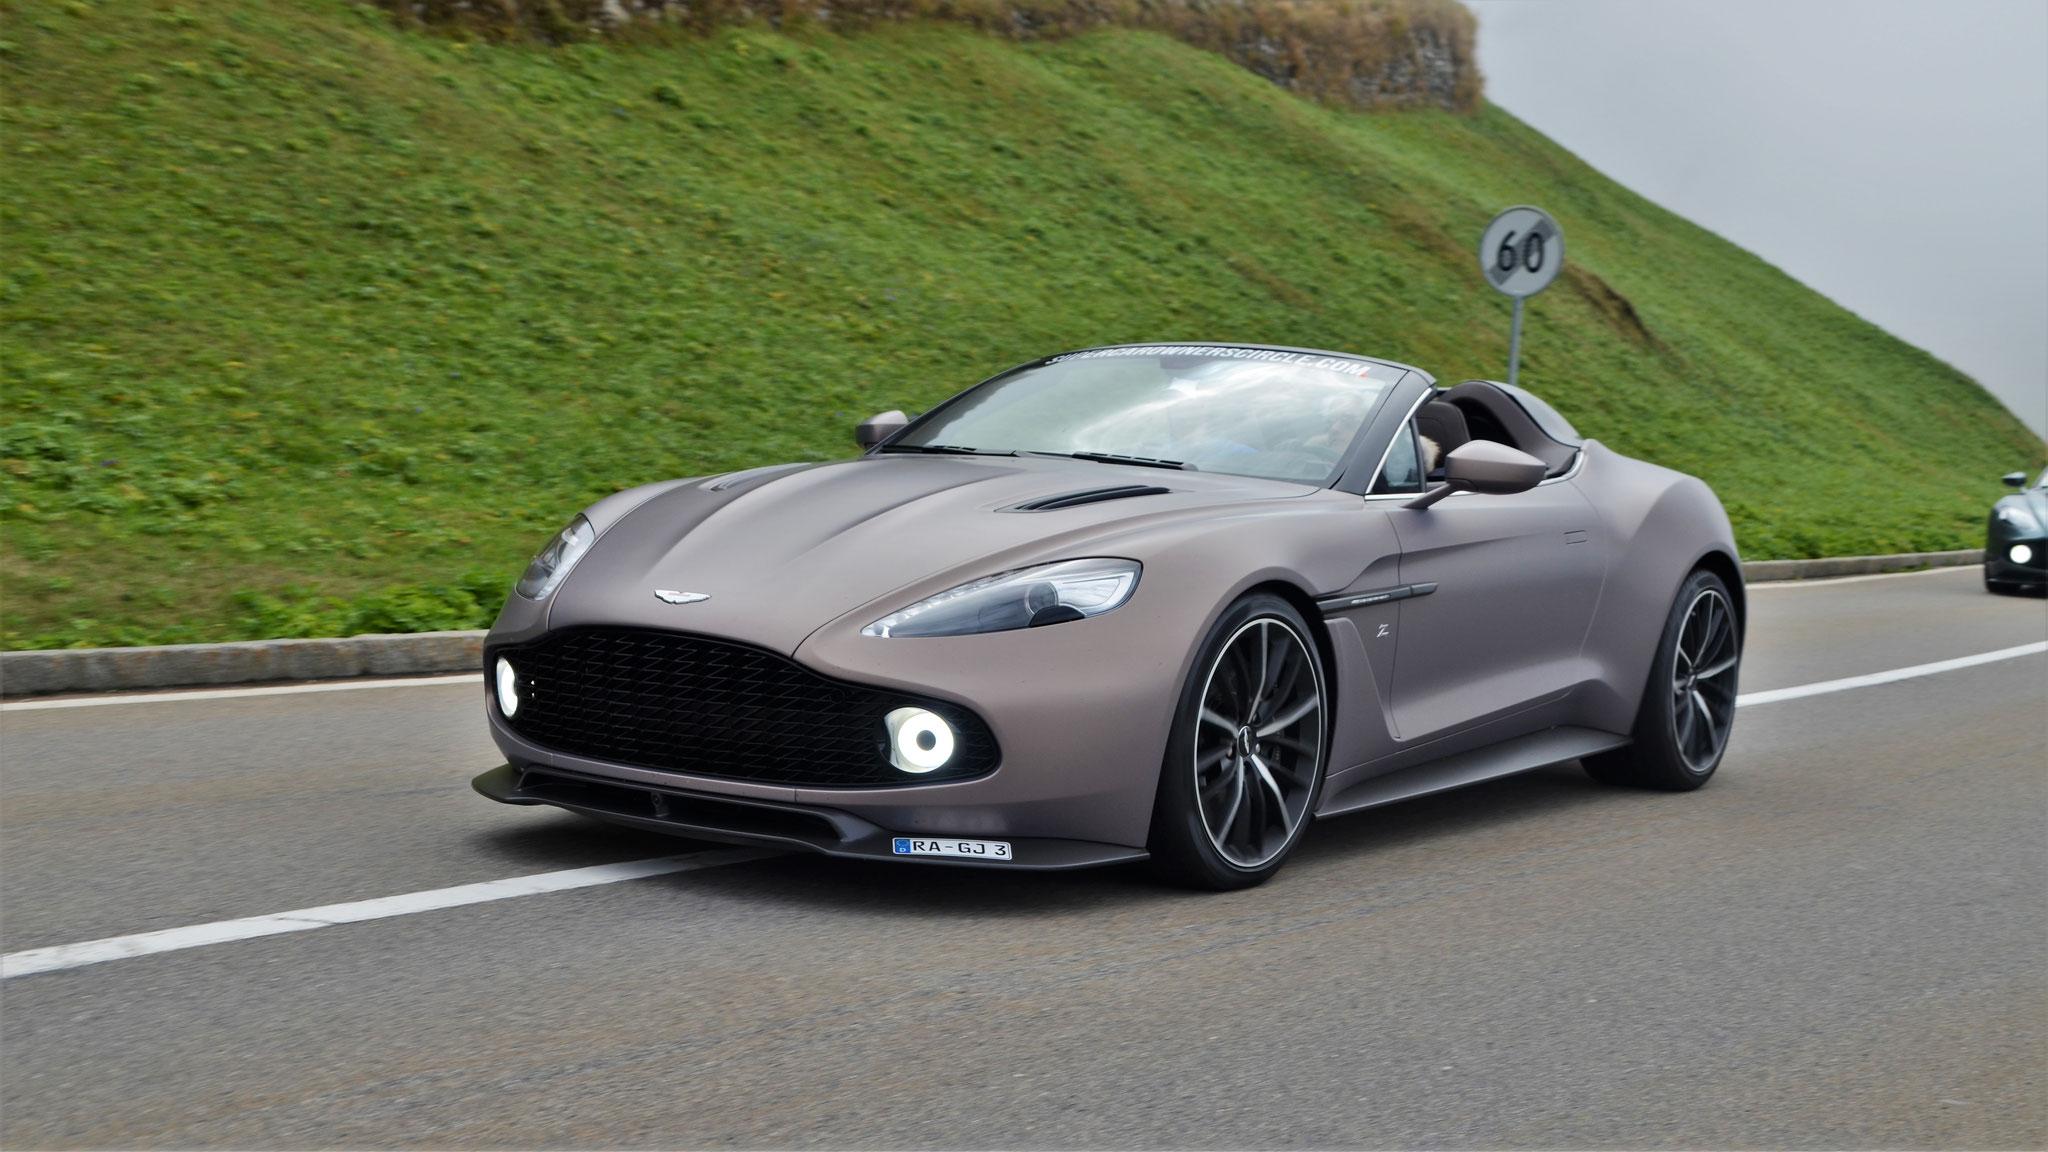 Aston Martin Vanquish Zagato Speedster - RA-GJ-3 (1 of 28)